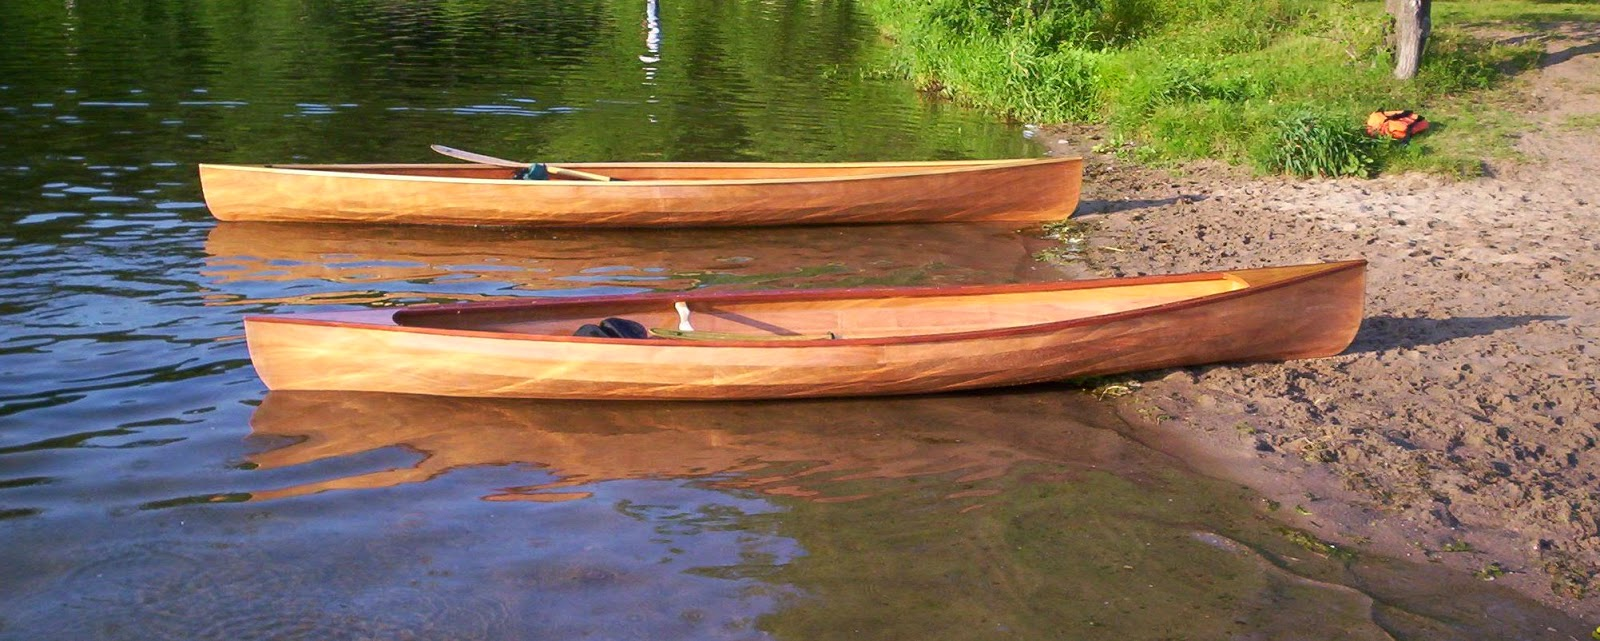 Plywood Fishing Boat Plans Free Popular Plans Boat